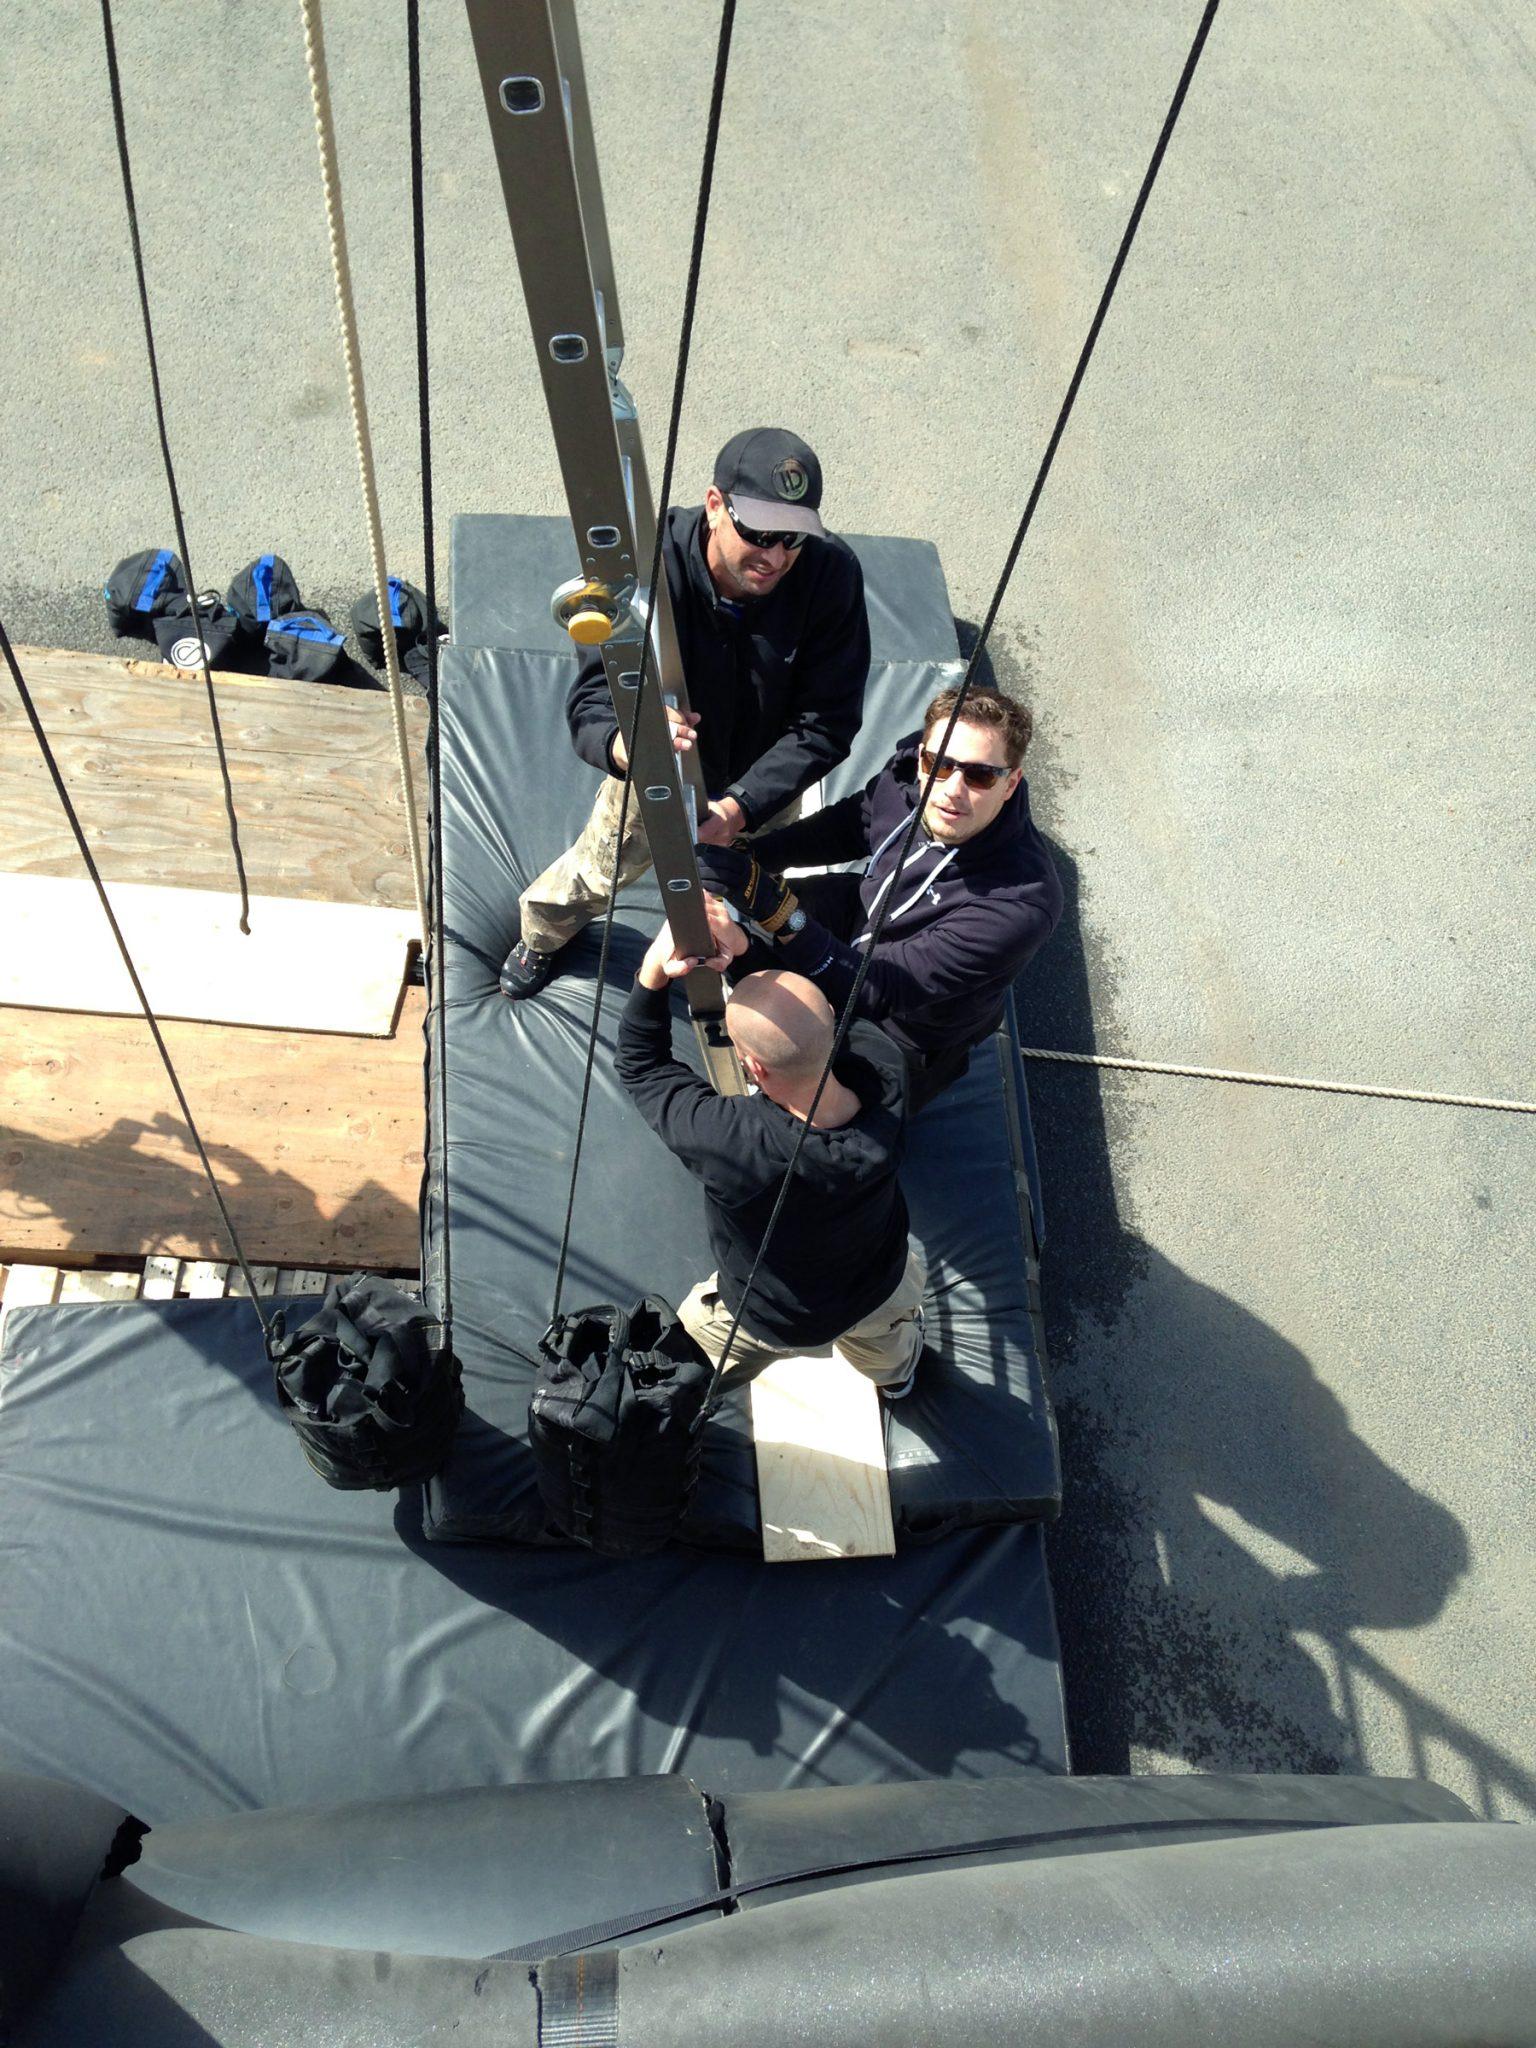 MG-Action, Martin Goeres, Stunt, Rigging, Safety, London, utility Stunt